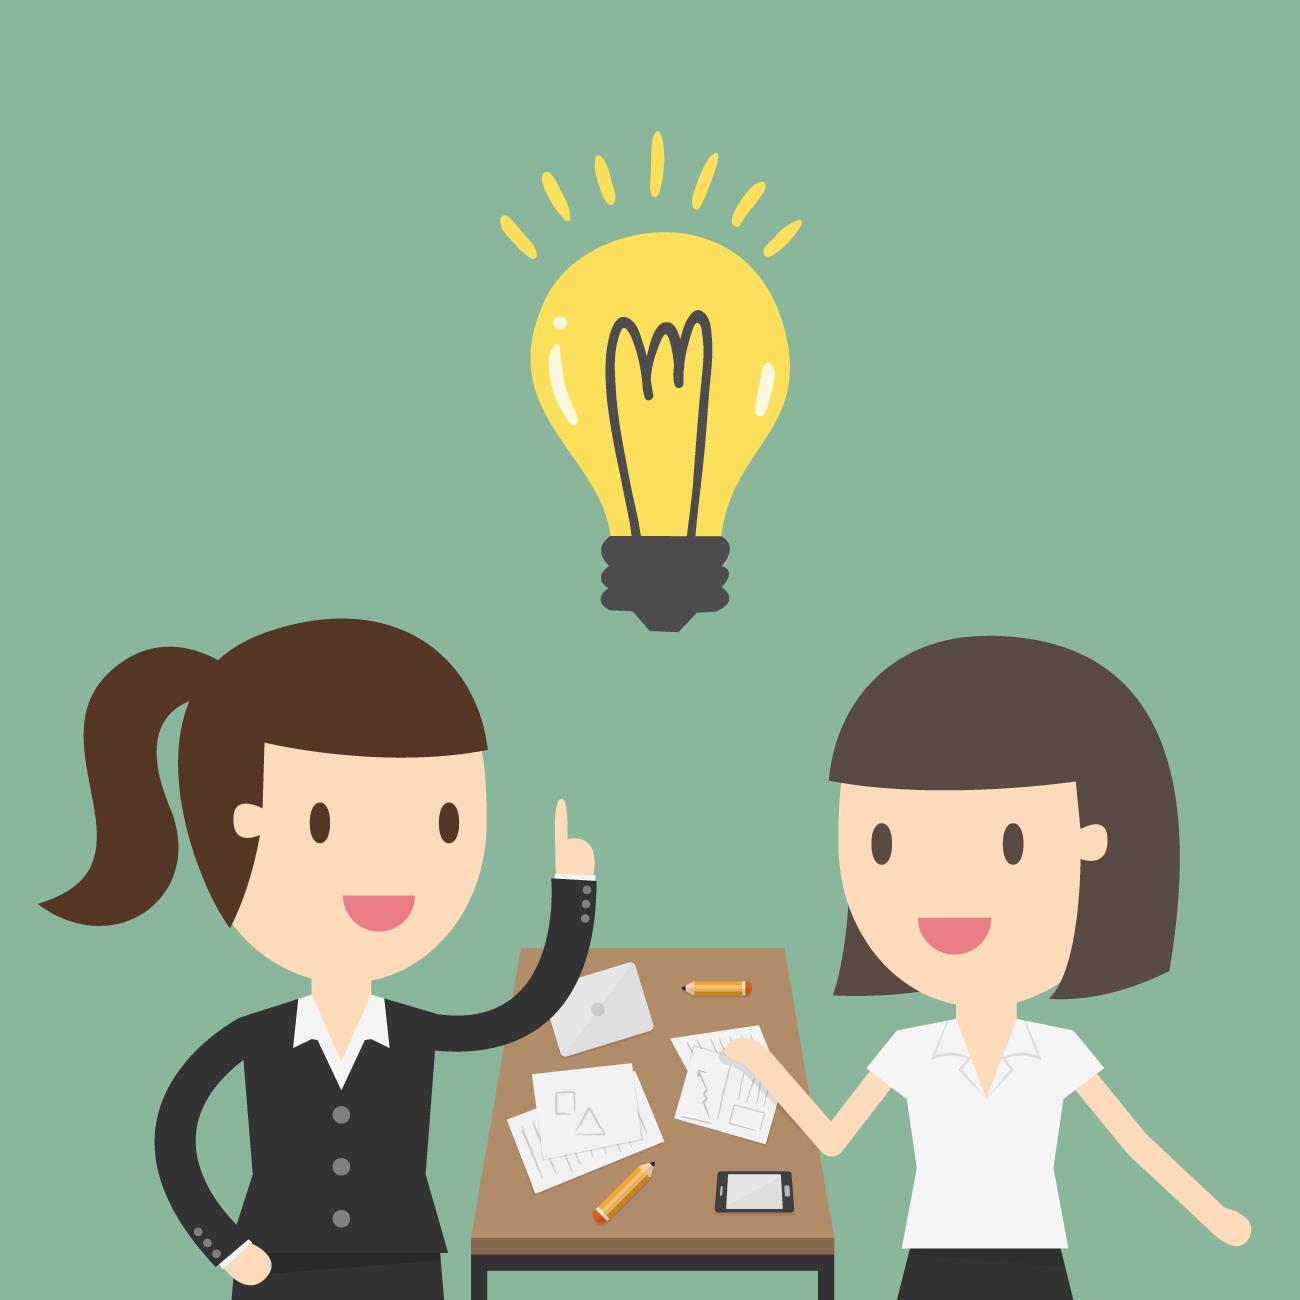 Entrepreneur blogging ideas